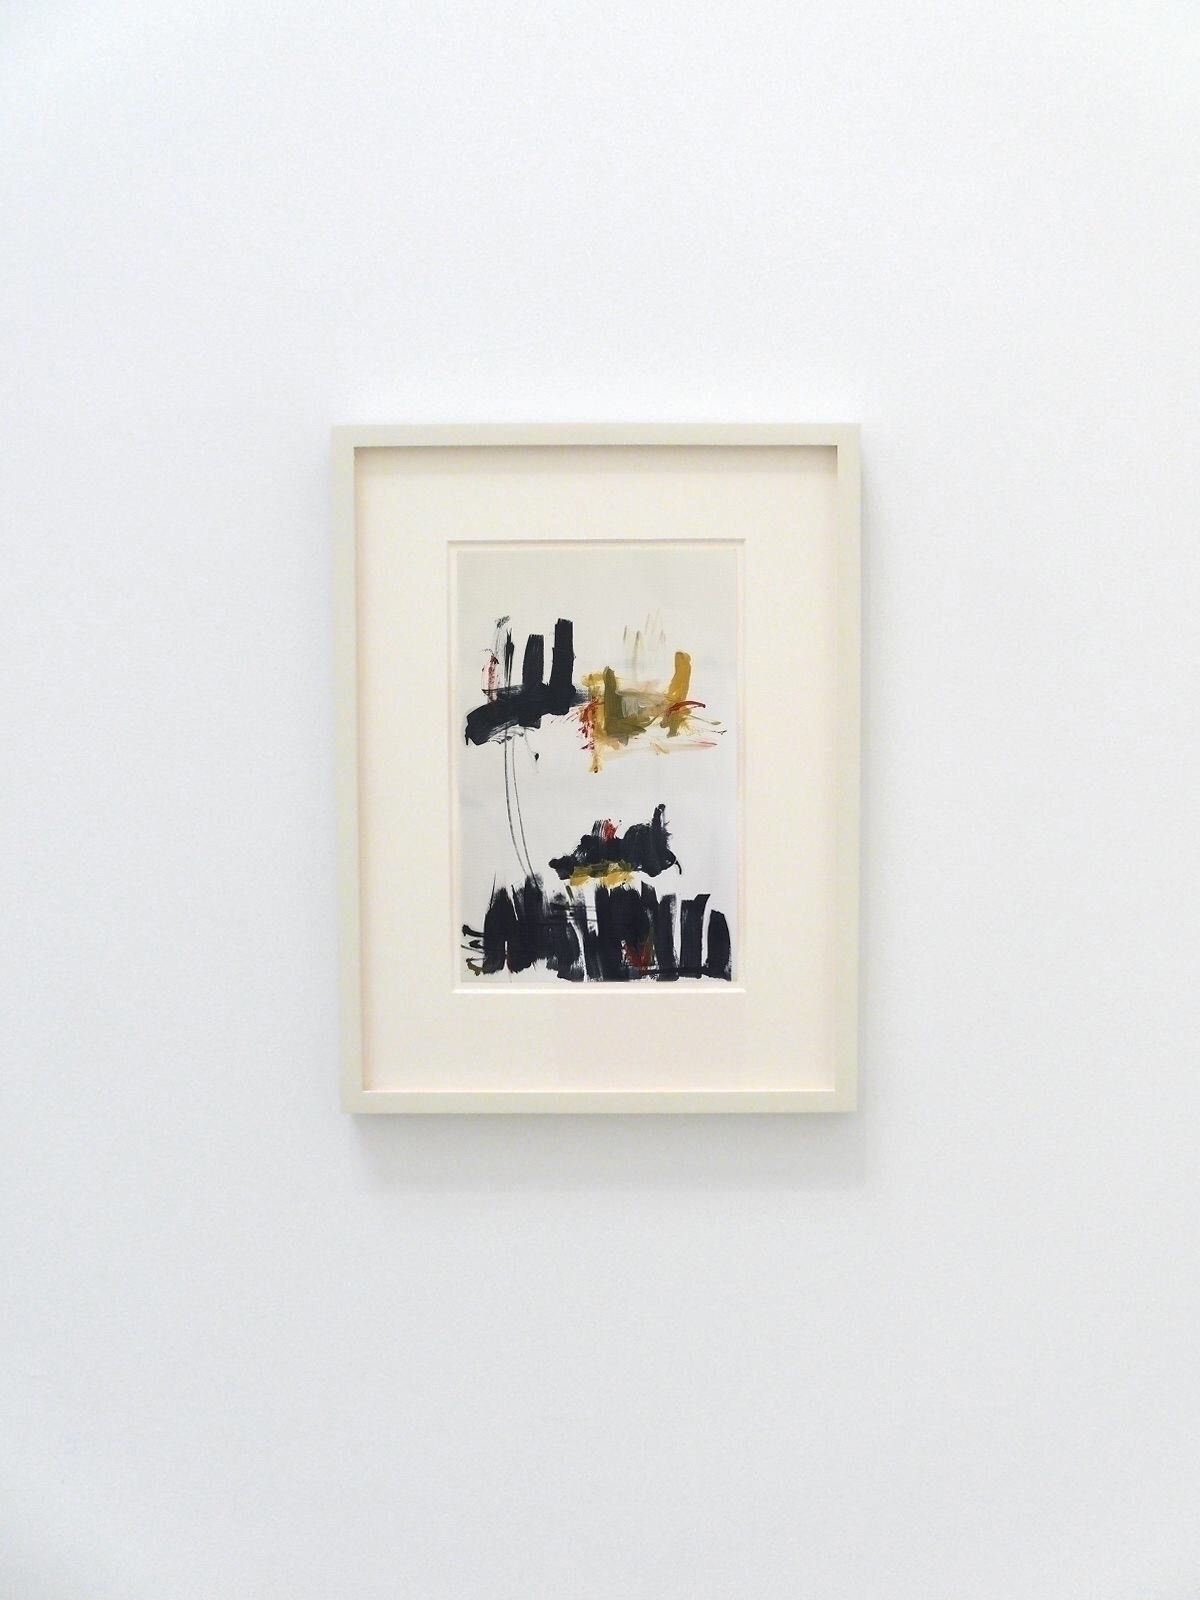 Oil paper - art, elloart, artwork - mkgv   ello